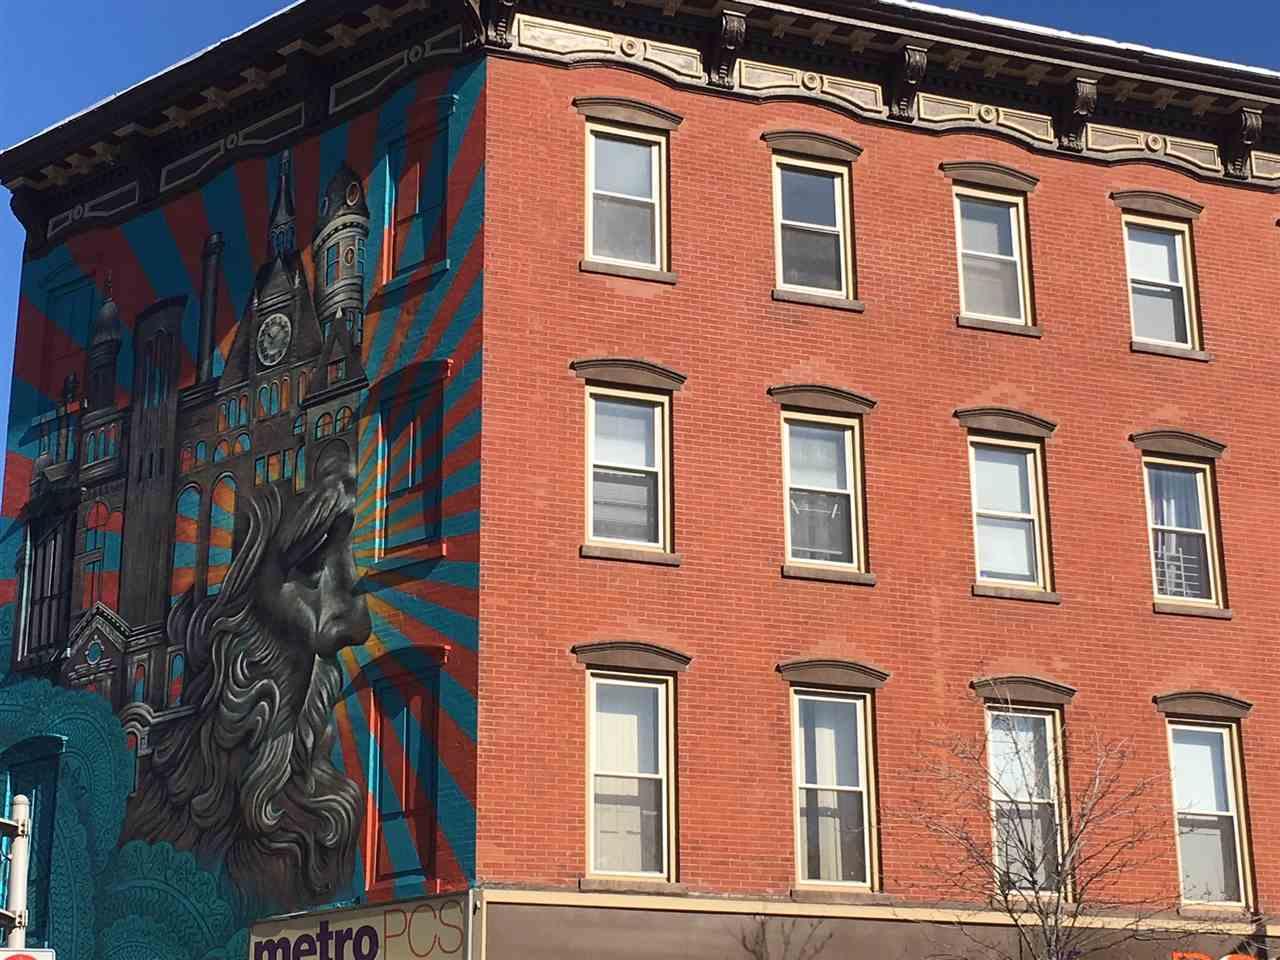 264 NEWARK AVE 1, JC, Downtown, NJ 07302